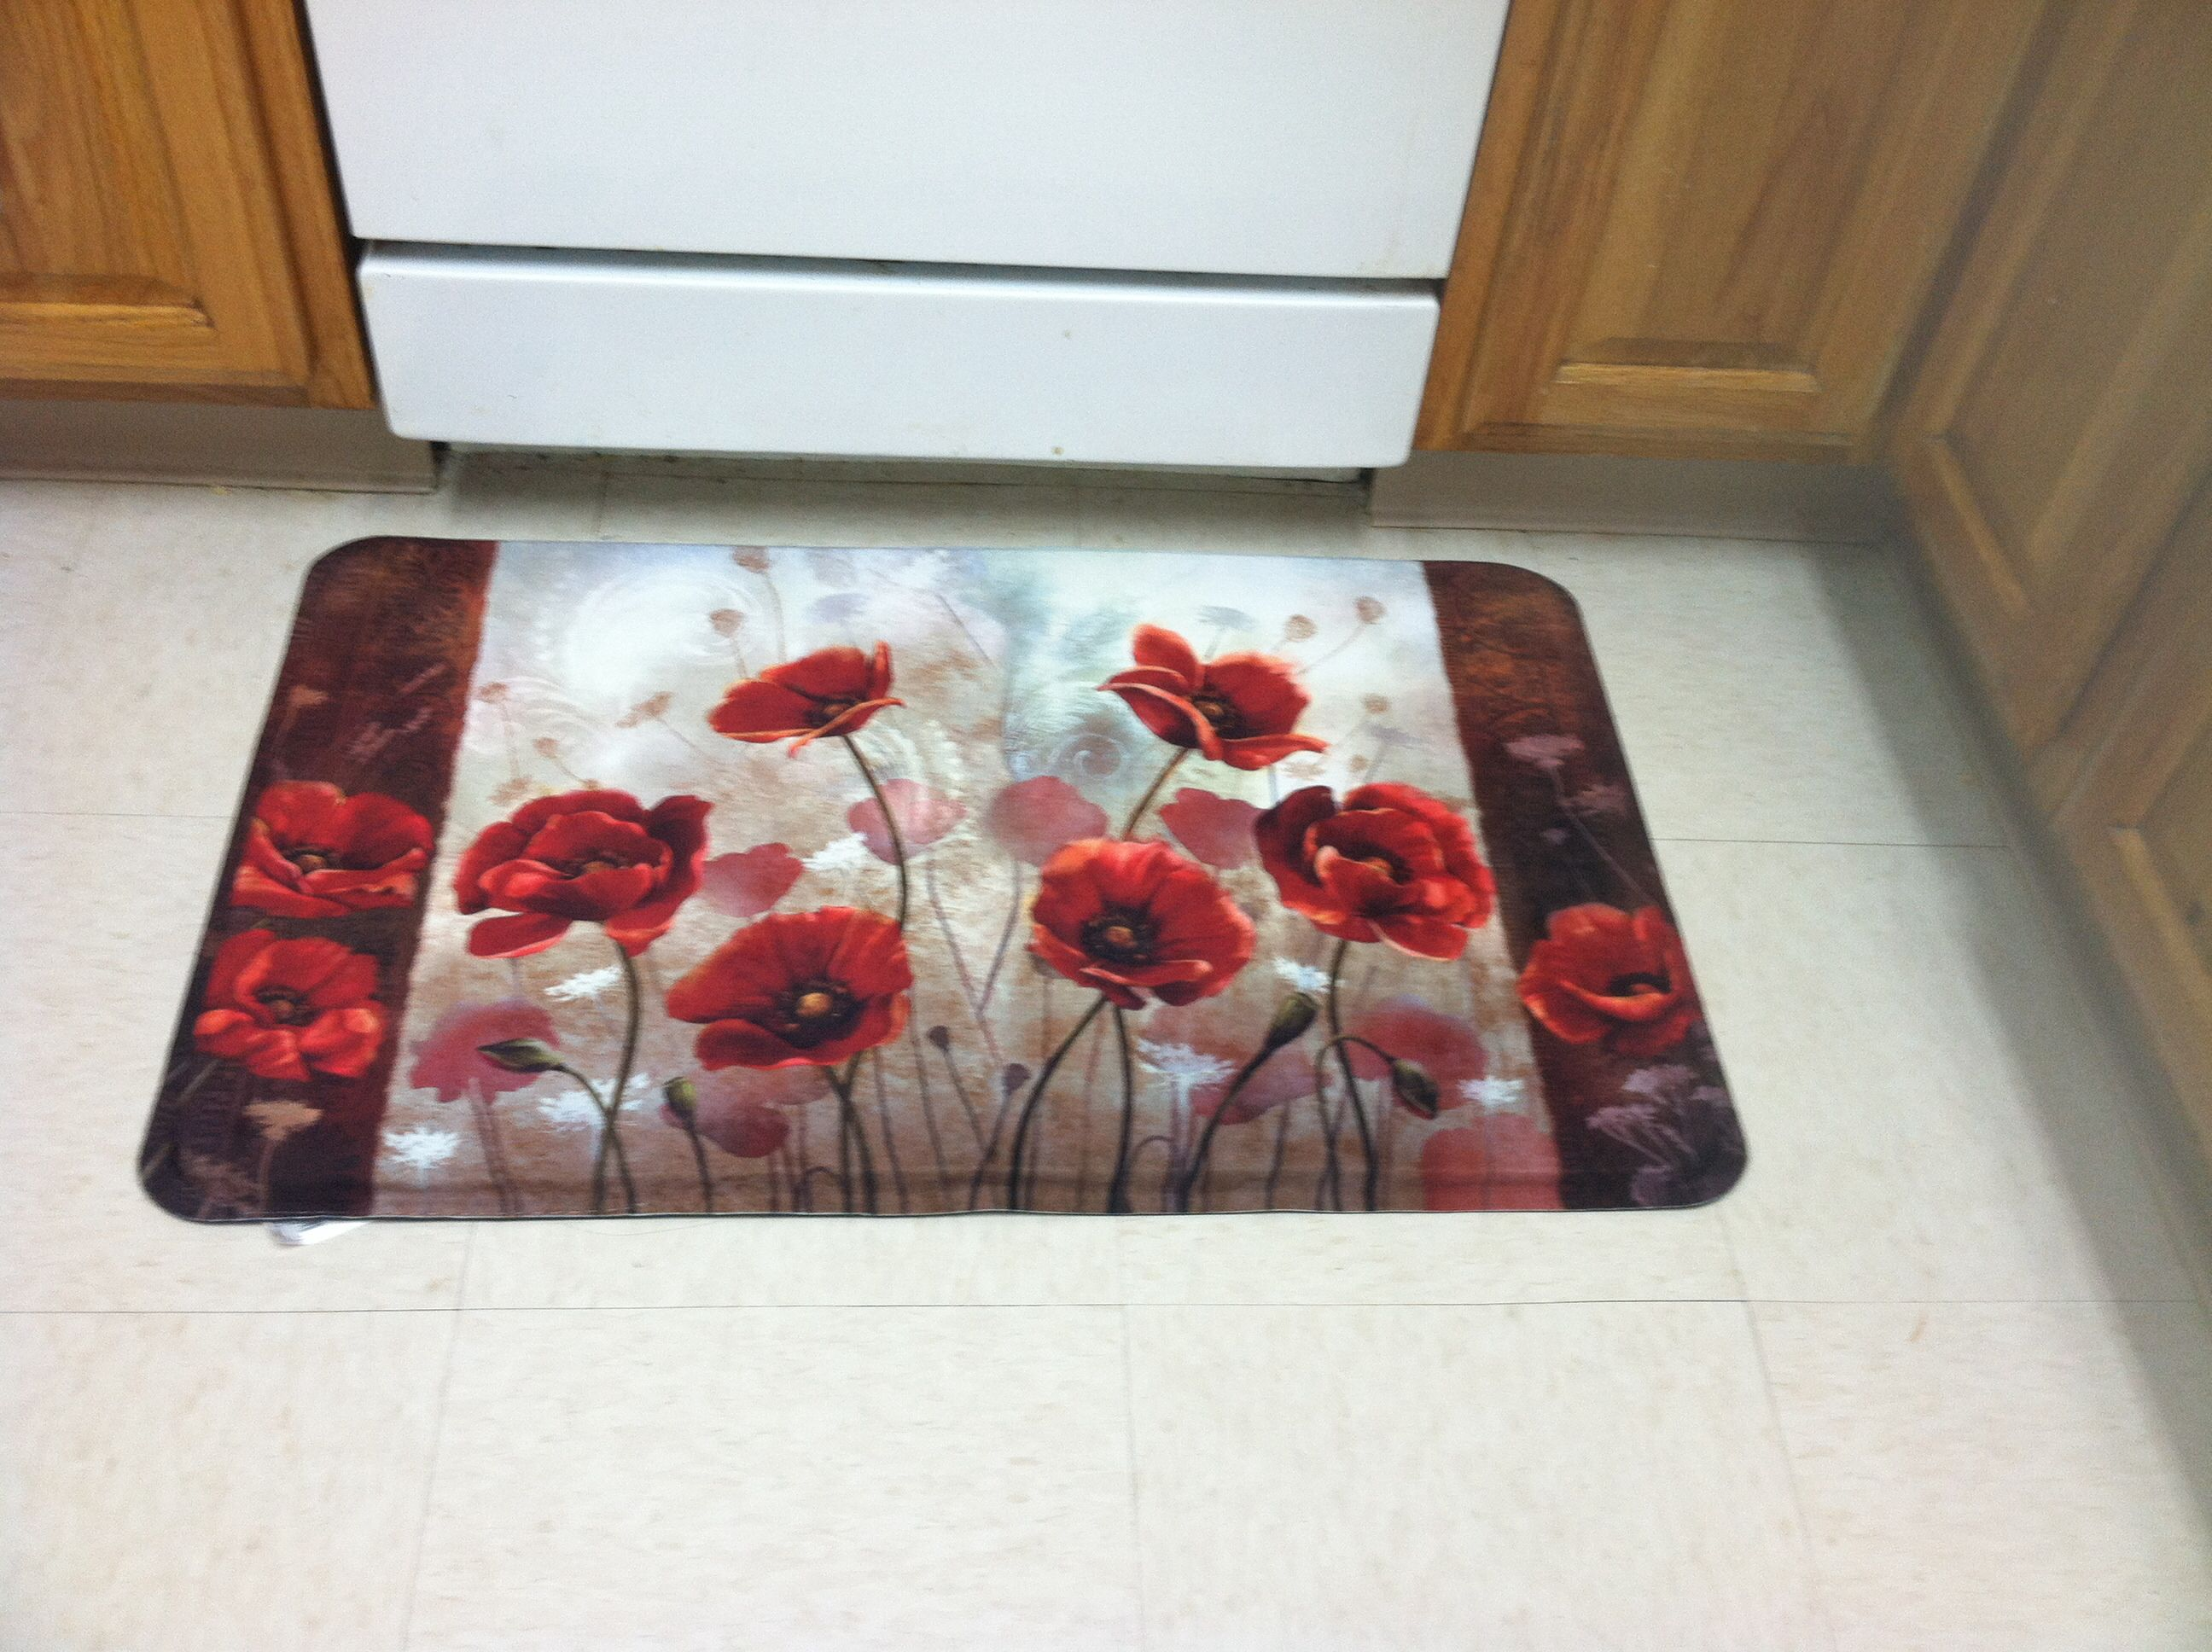 Poppy Kitchen Mat From Bed Bath And Beyond Poppy Decor Kitchen